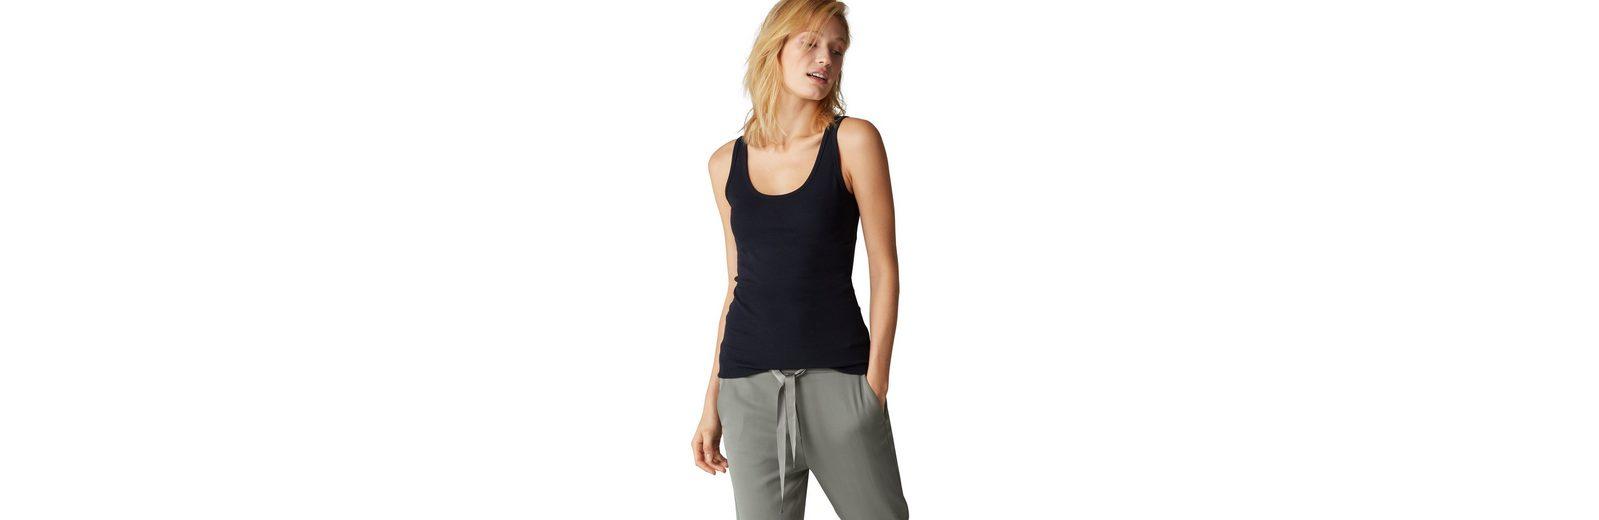 Unter Online-Verkauf Marc O'Polo T-Shirt Perfekt Zum Verkauf Billig Verkauf Limitierter Auflage Outlet Factory Outlet 2018 Neuer Online-Verkauf ftZgianz